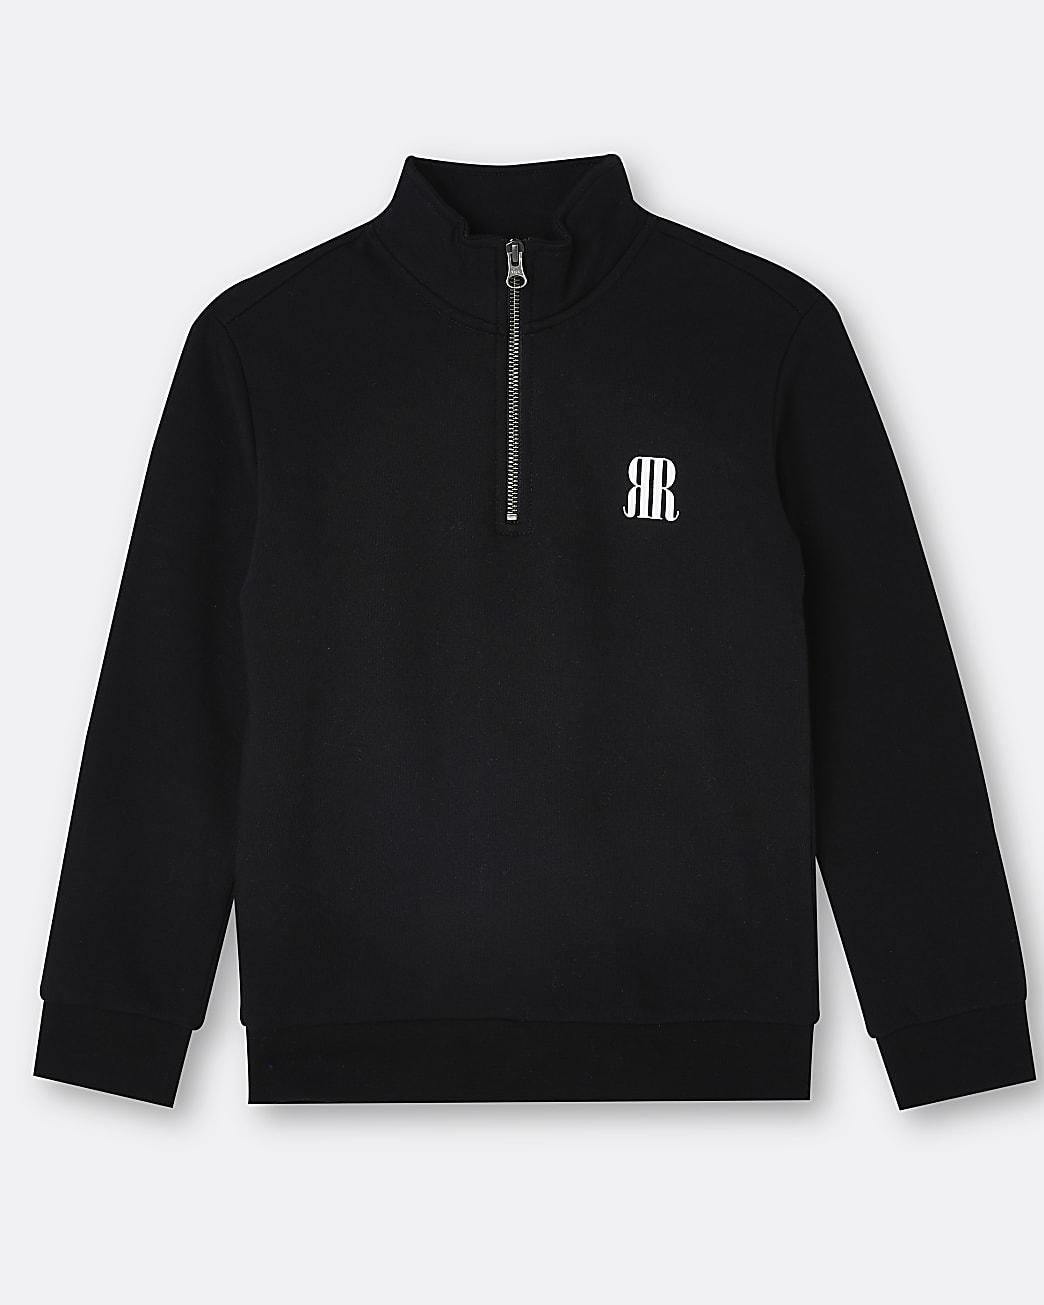 Age 13+ boys black RR funnel neck sweatshirt